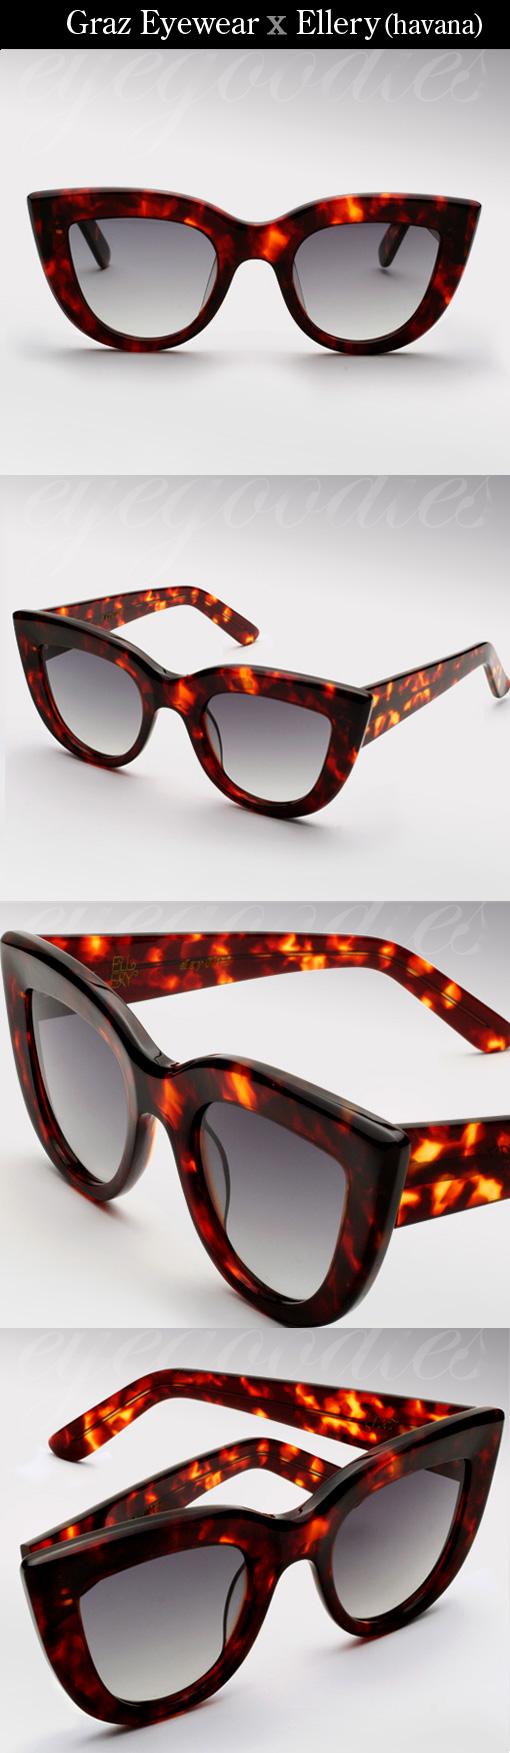 Graz Ellery sunglasses in havana